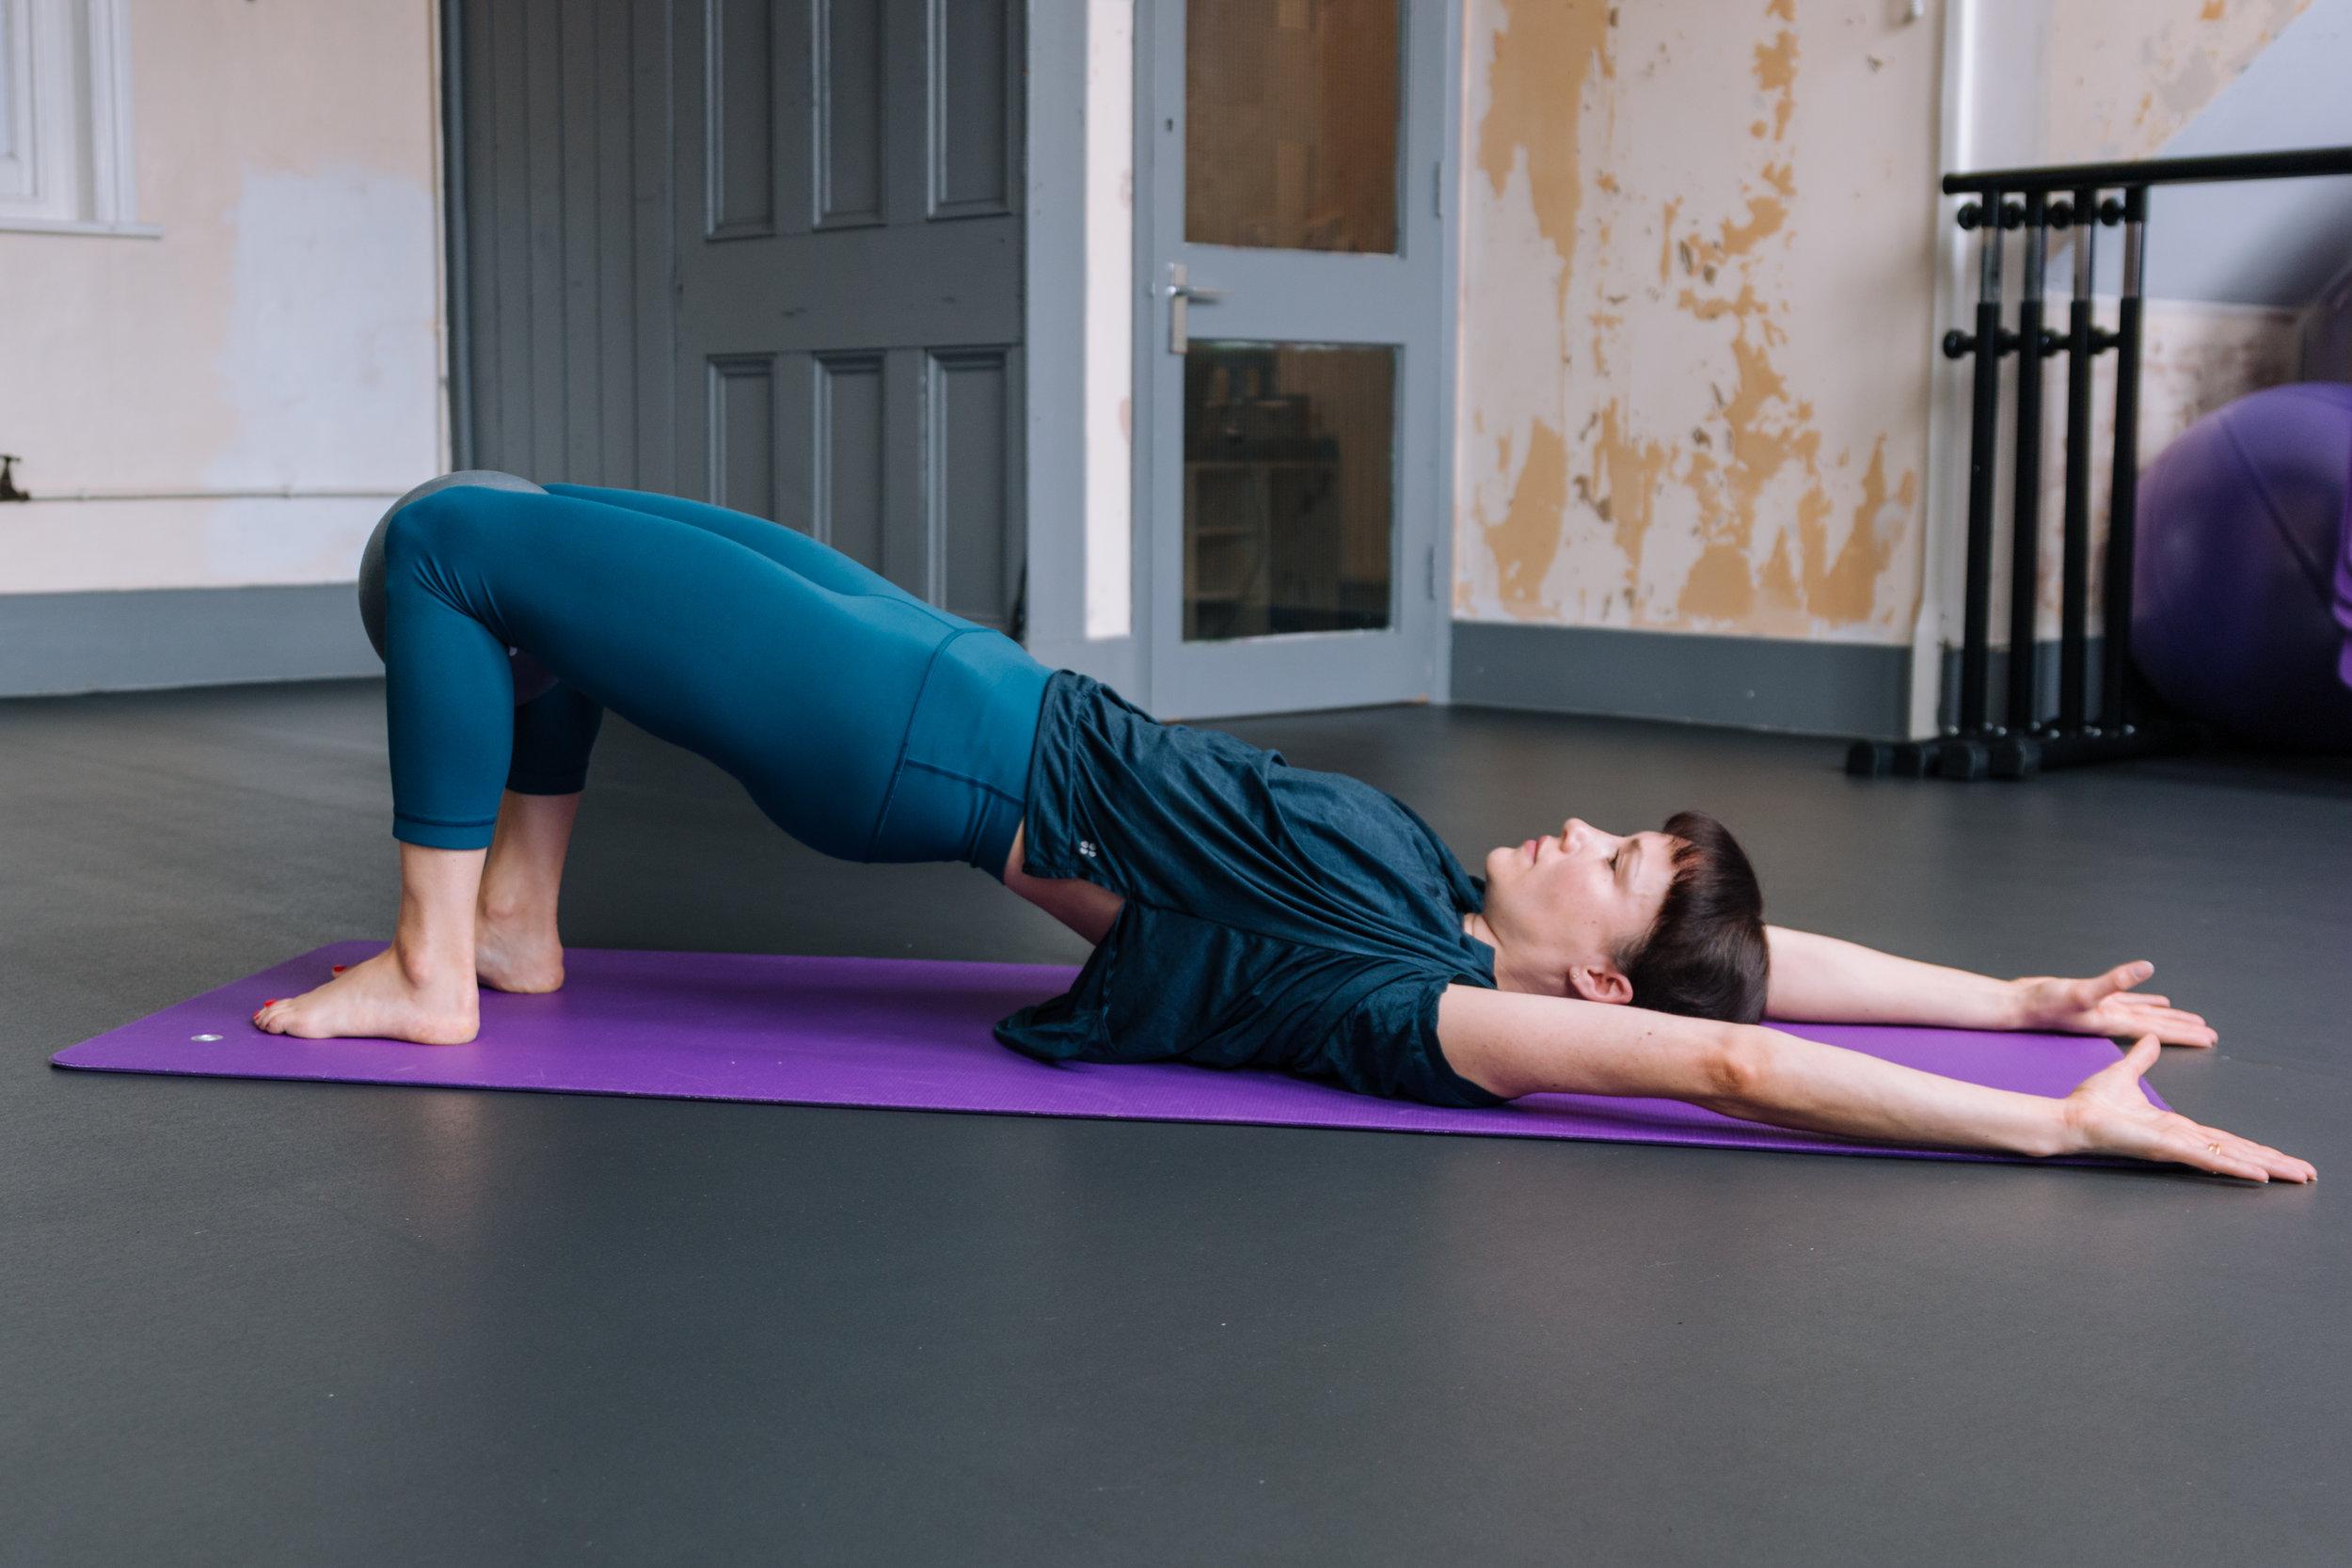 alex-marshall-pilates-pose-support-local-magazine-178-pose-2.jpg